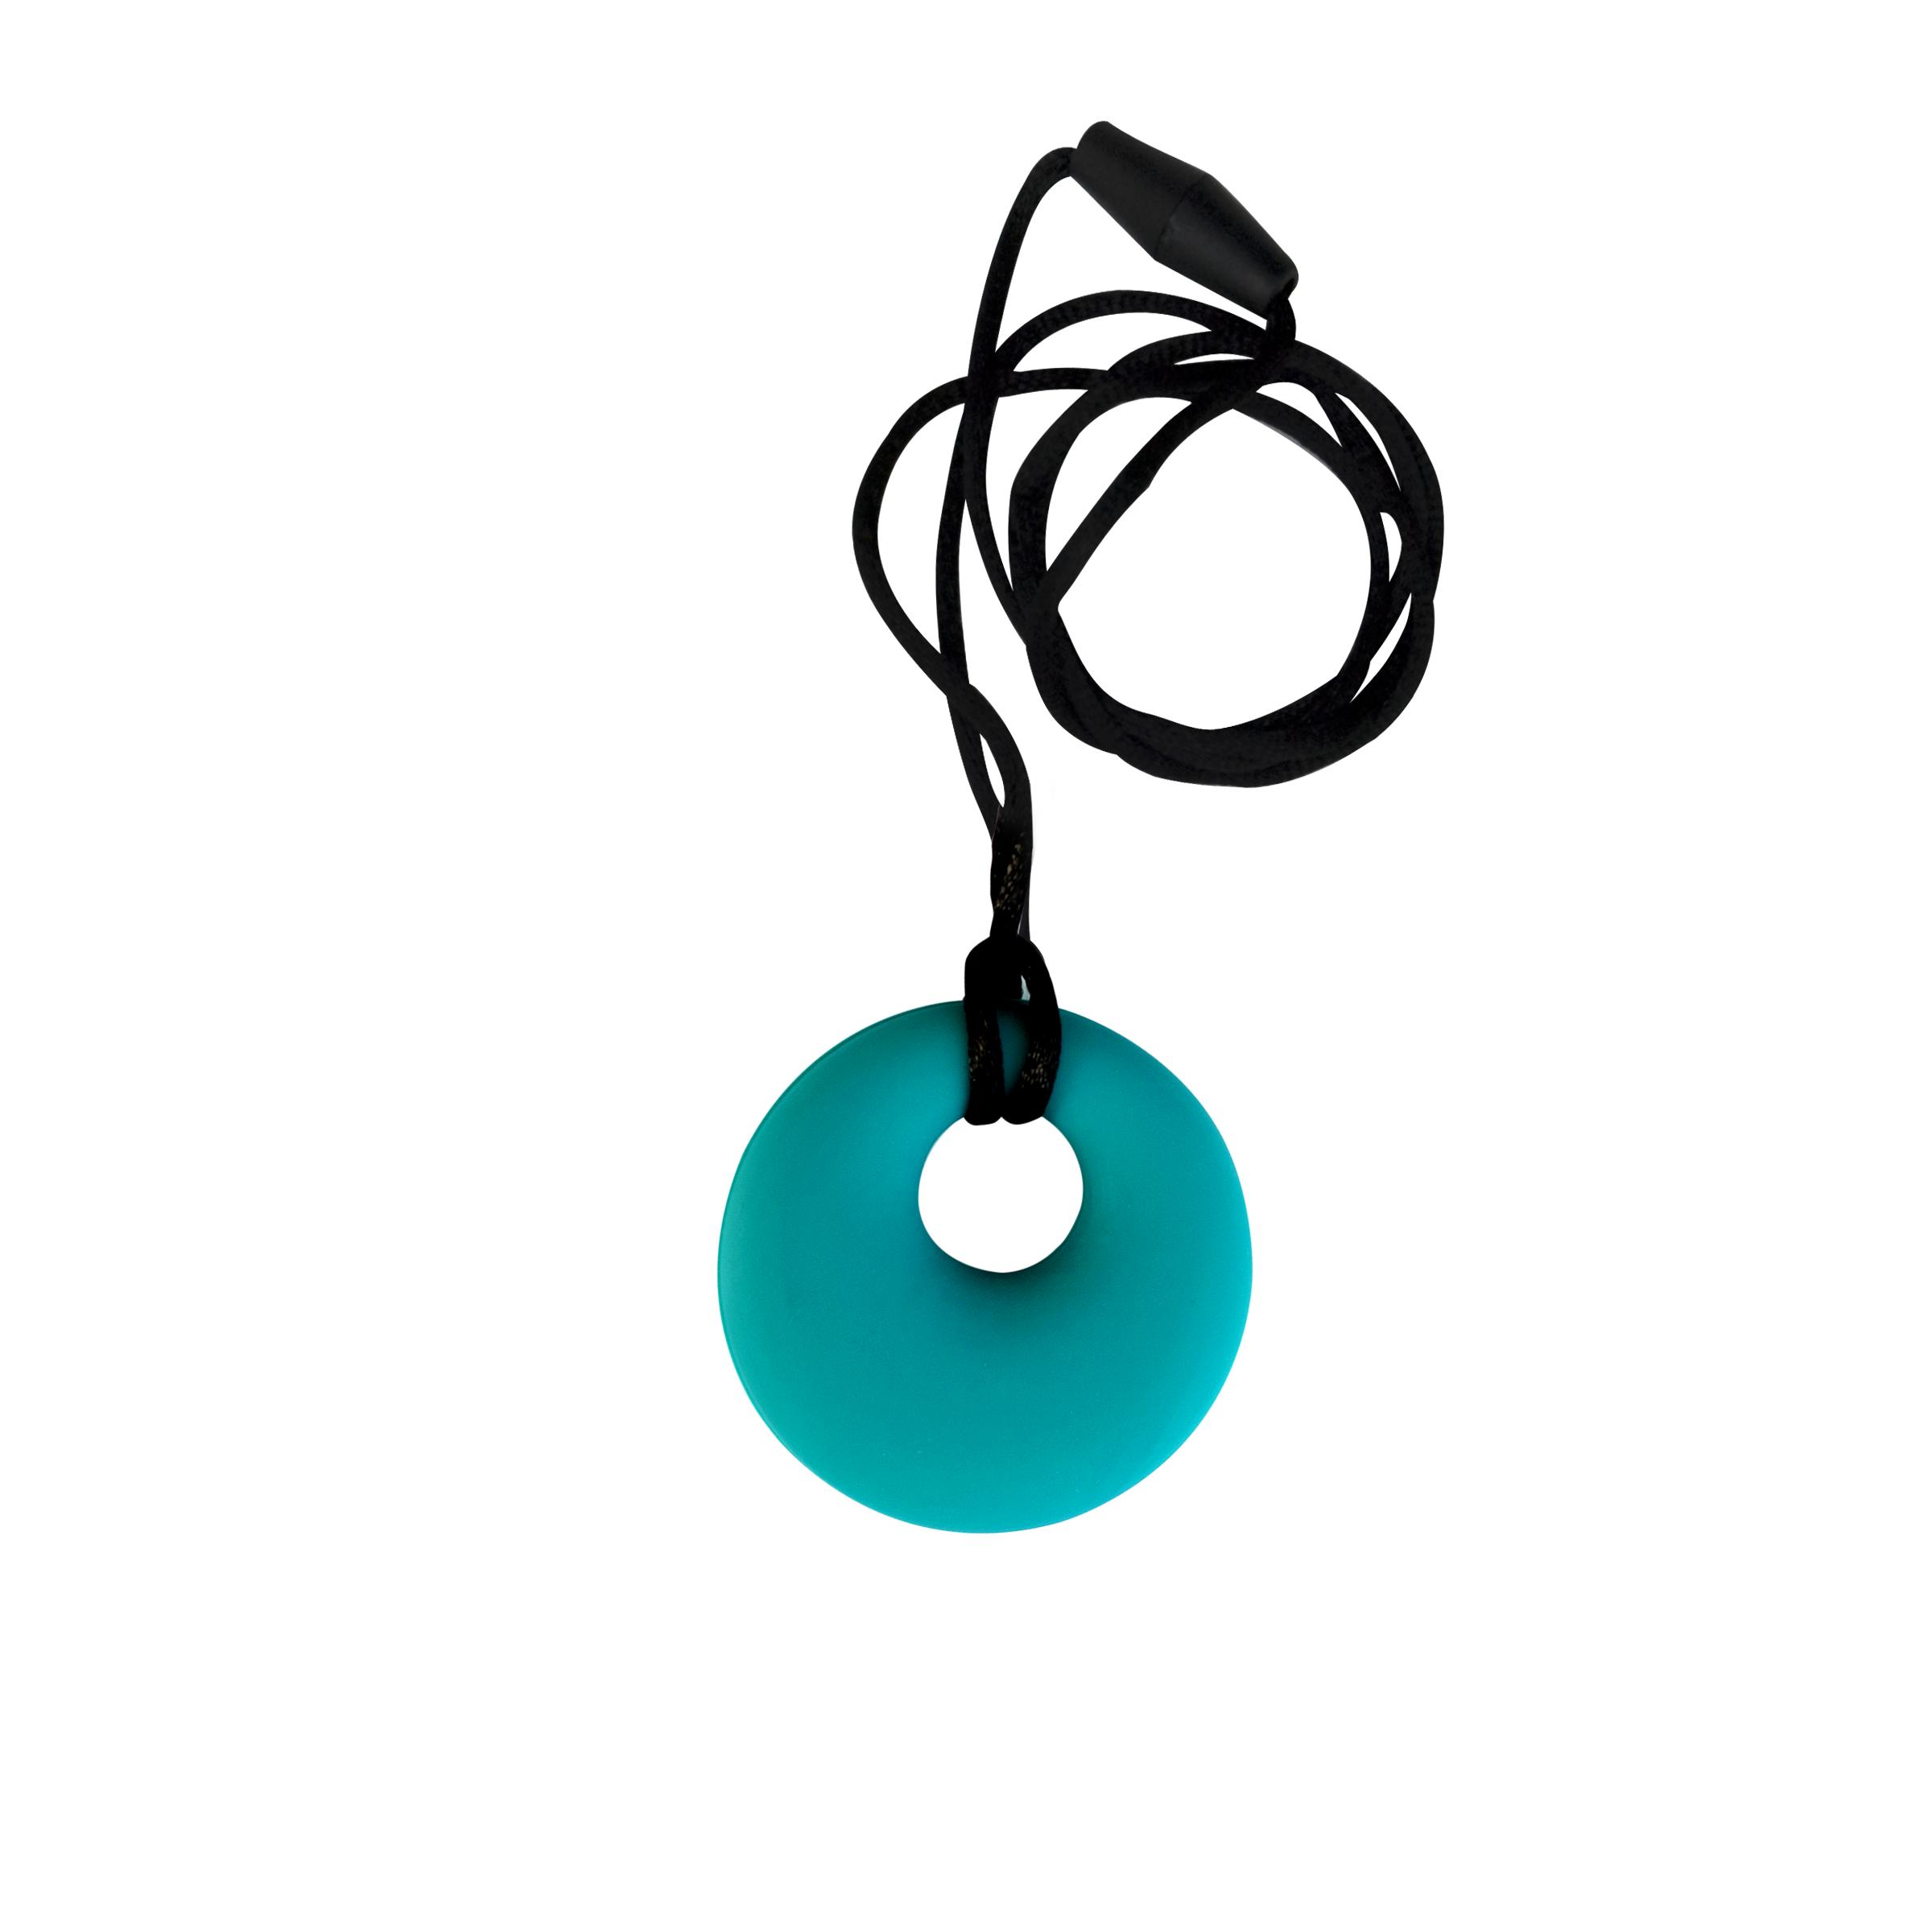 Annular - Turquoise